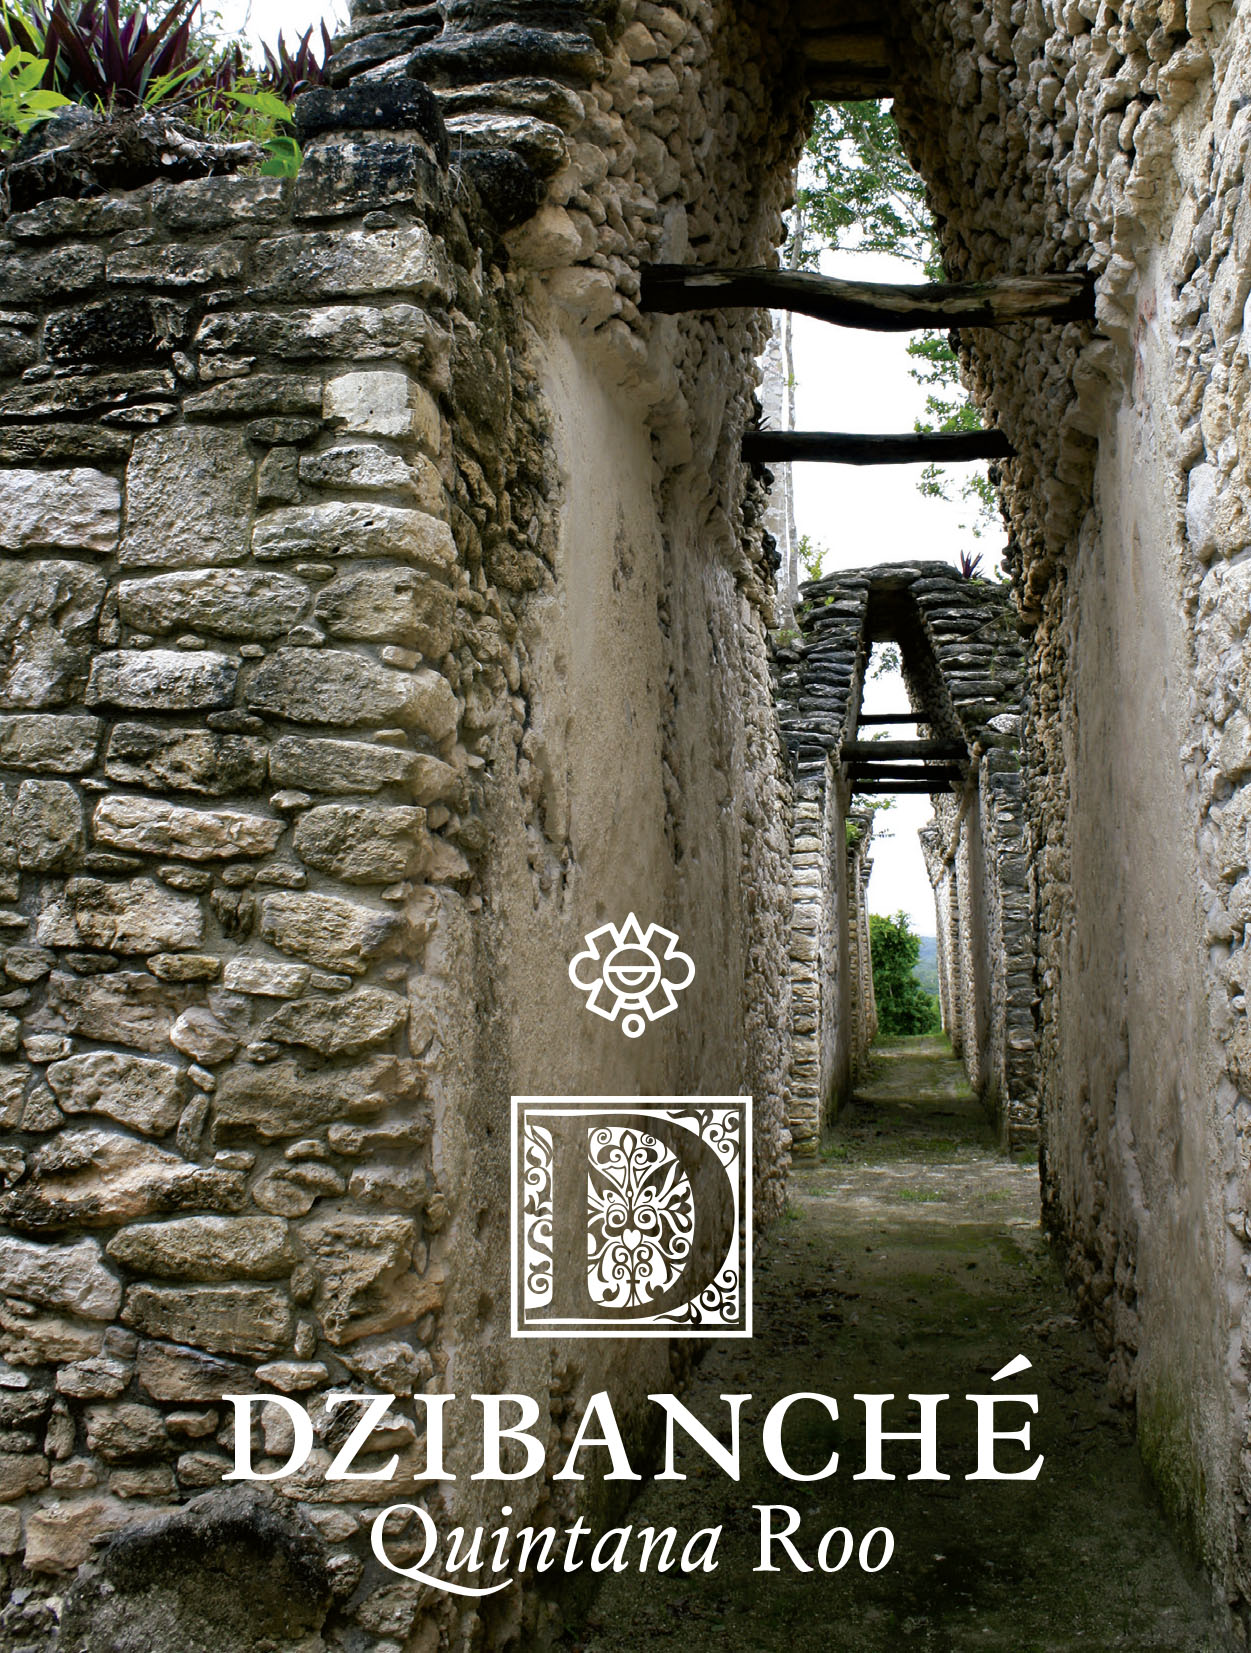 Dzibanché